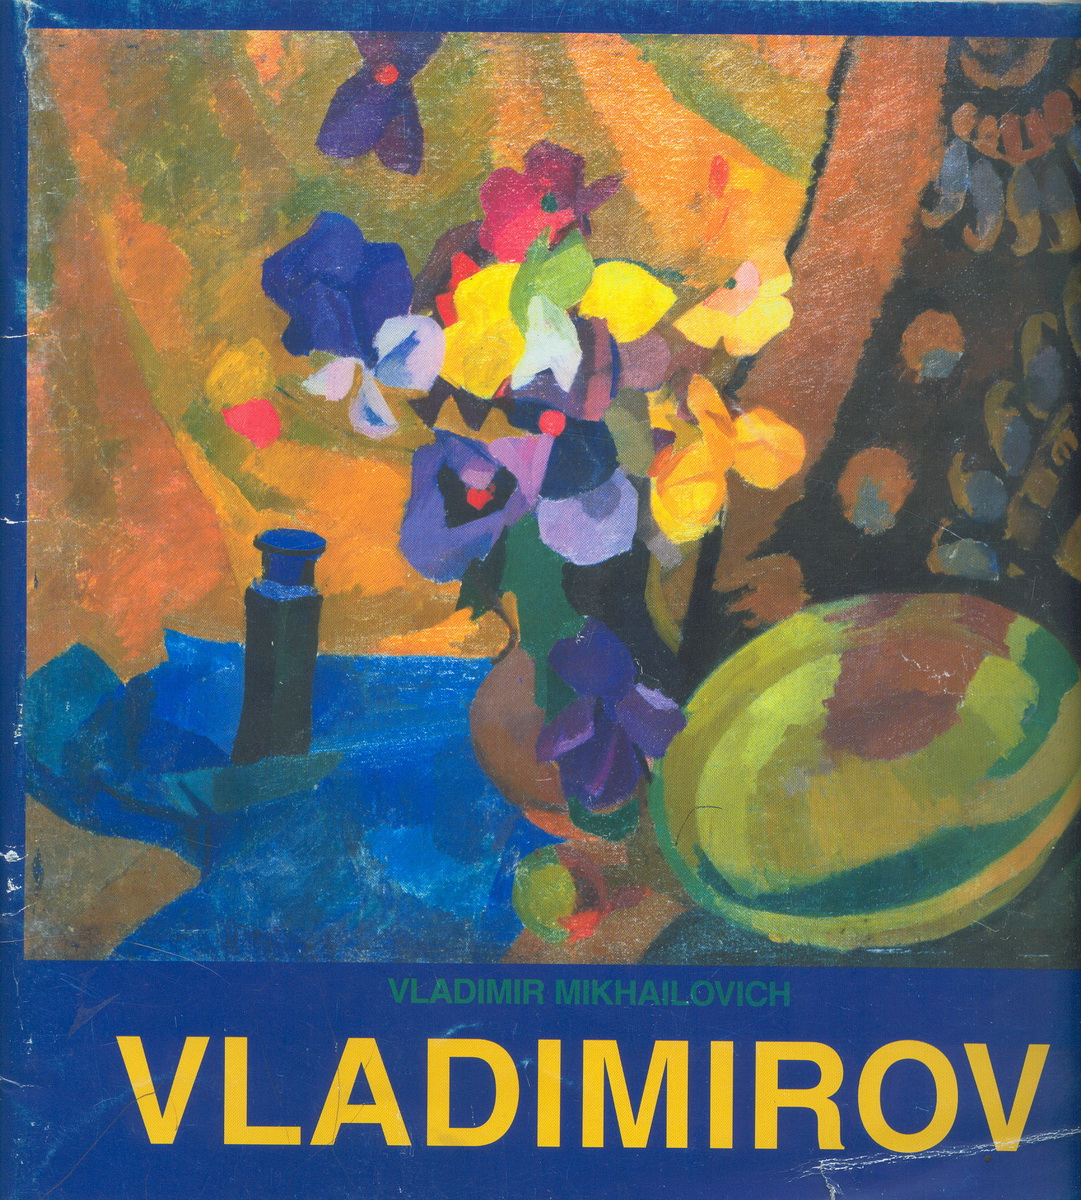 Vladimir Mikhailovich VLADIMIROV